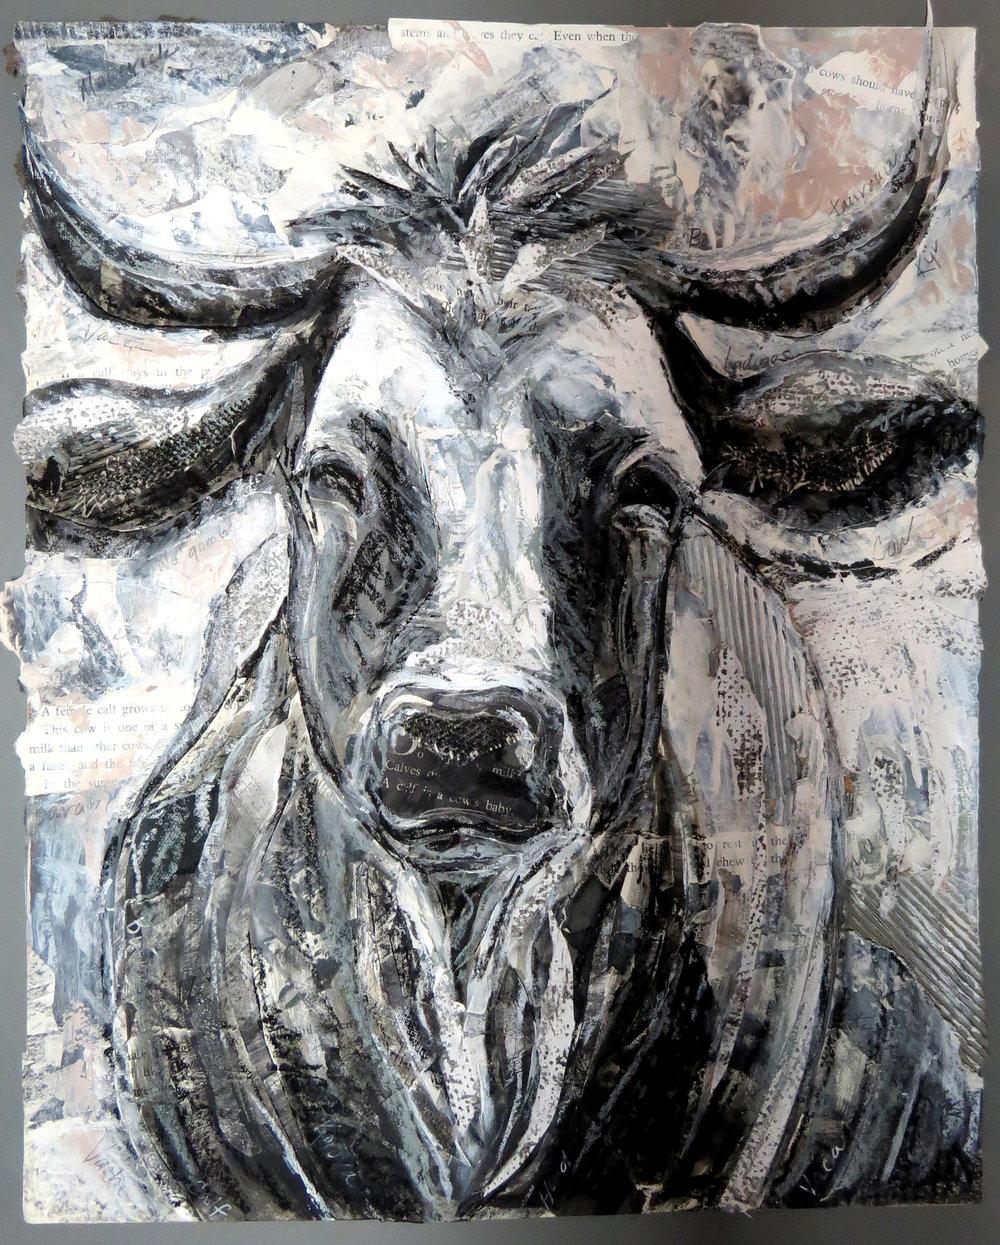 Cow, La Vache